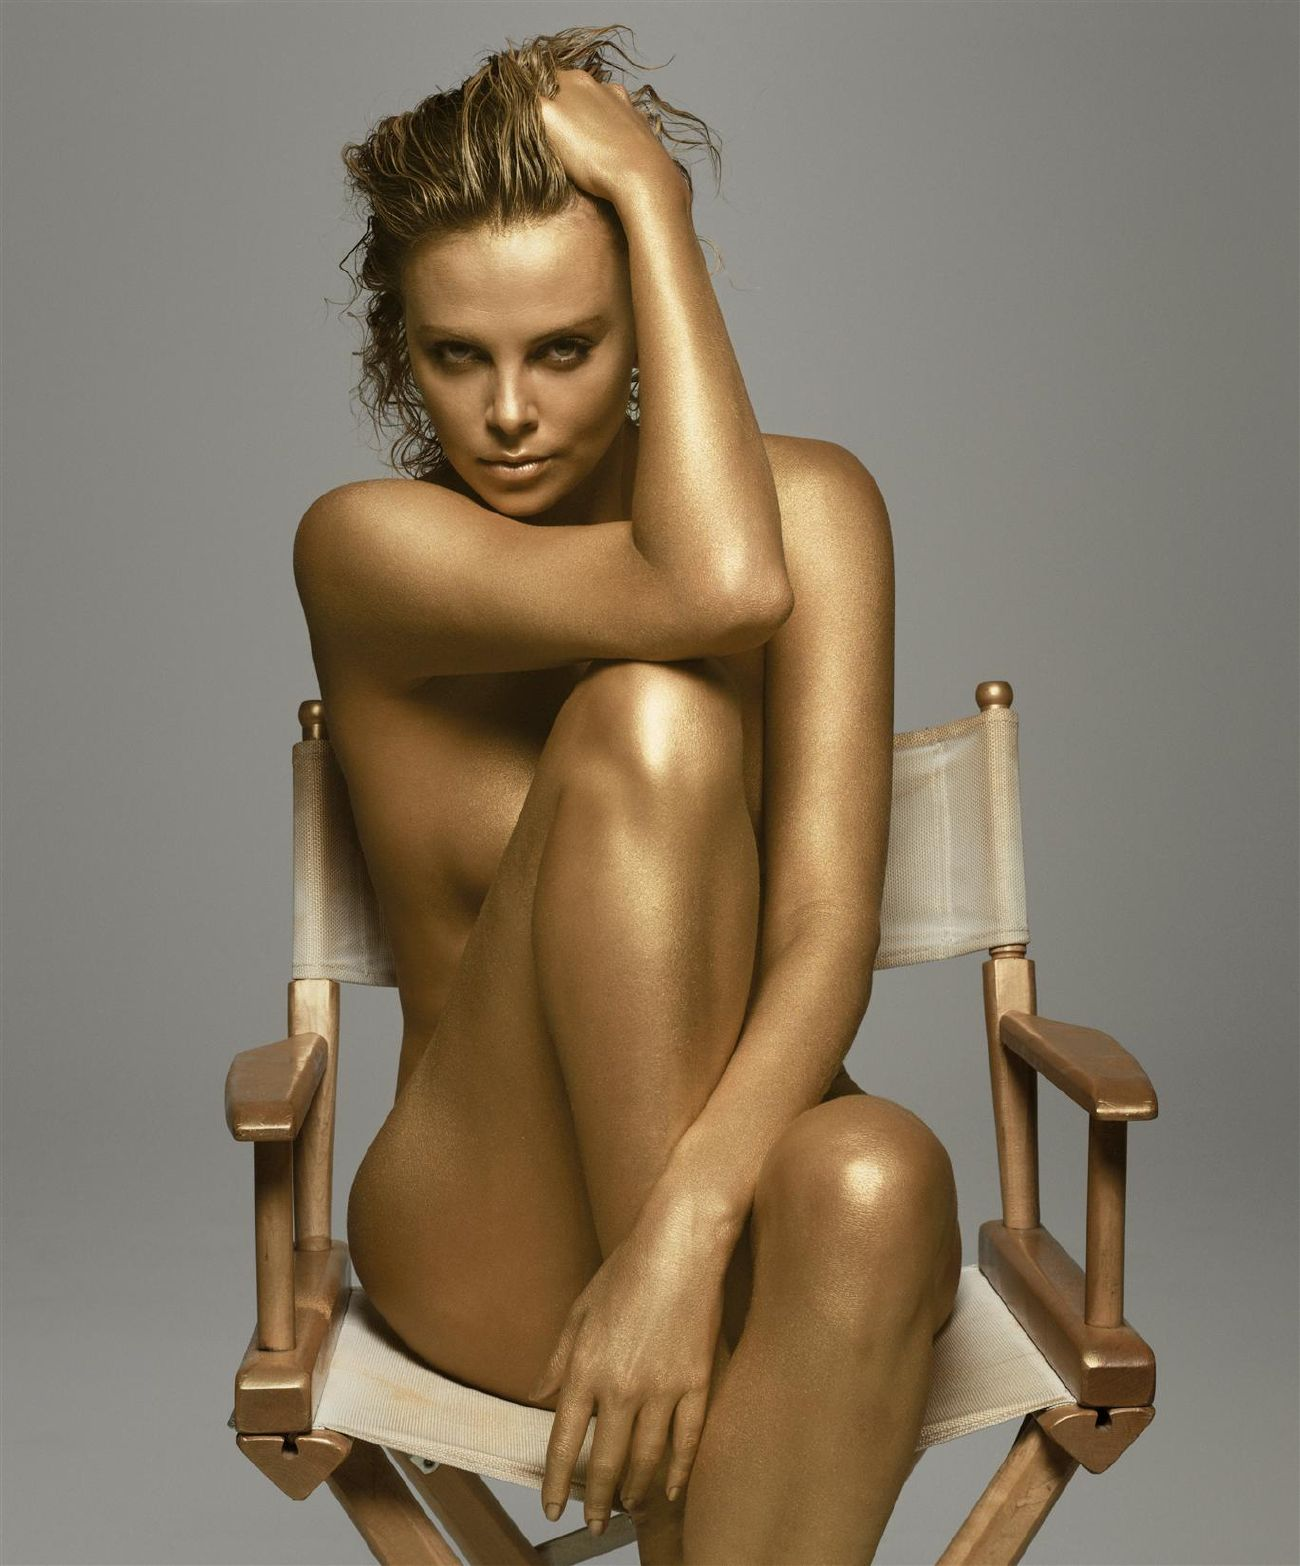 erotic massage logan chinese massage sydney